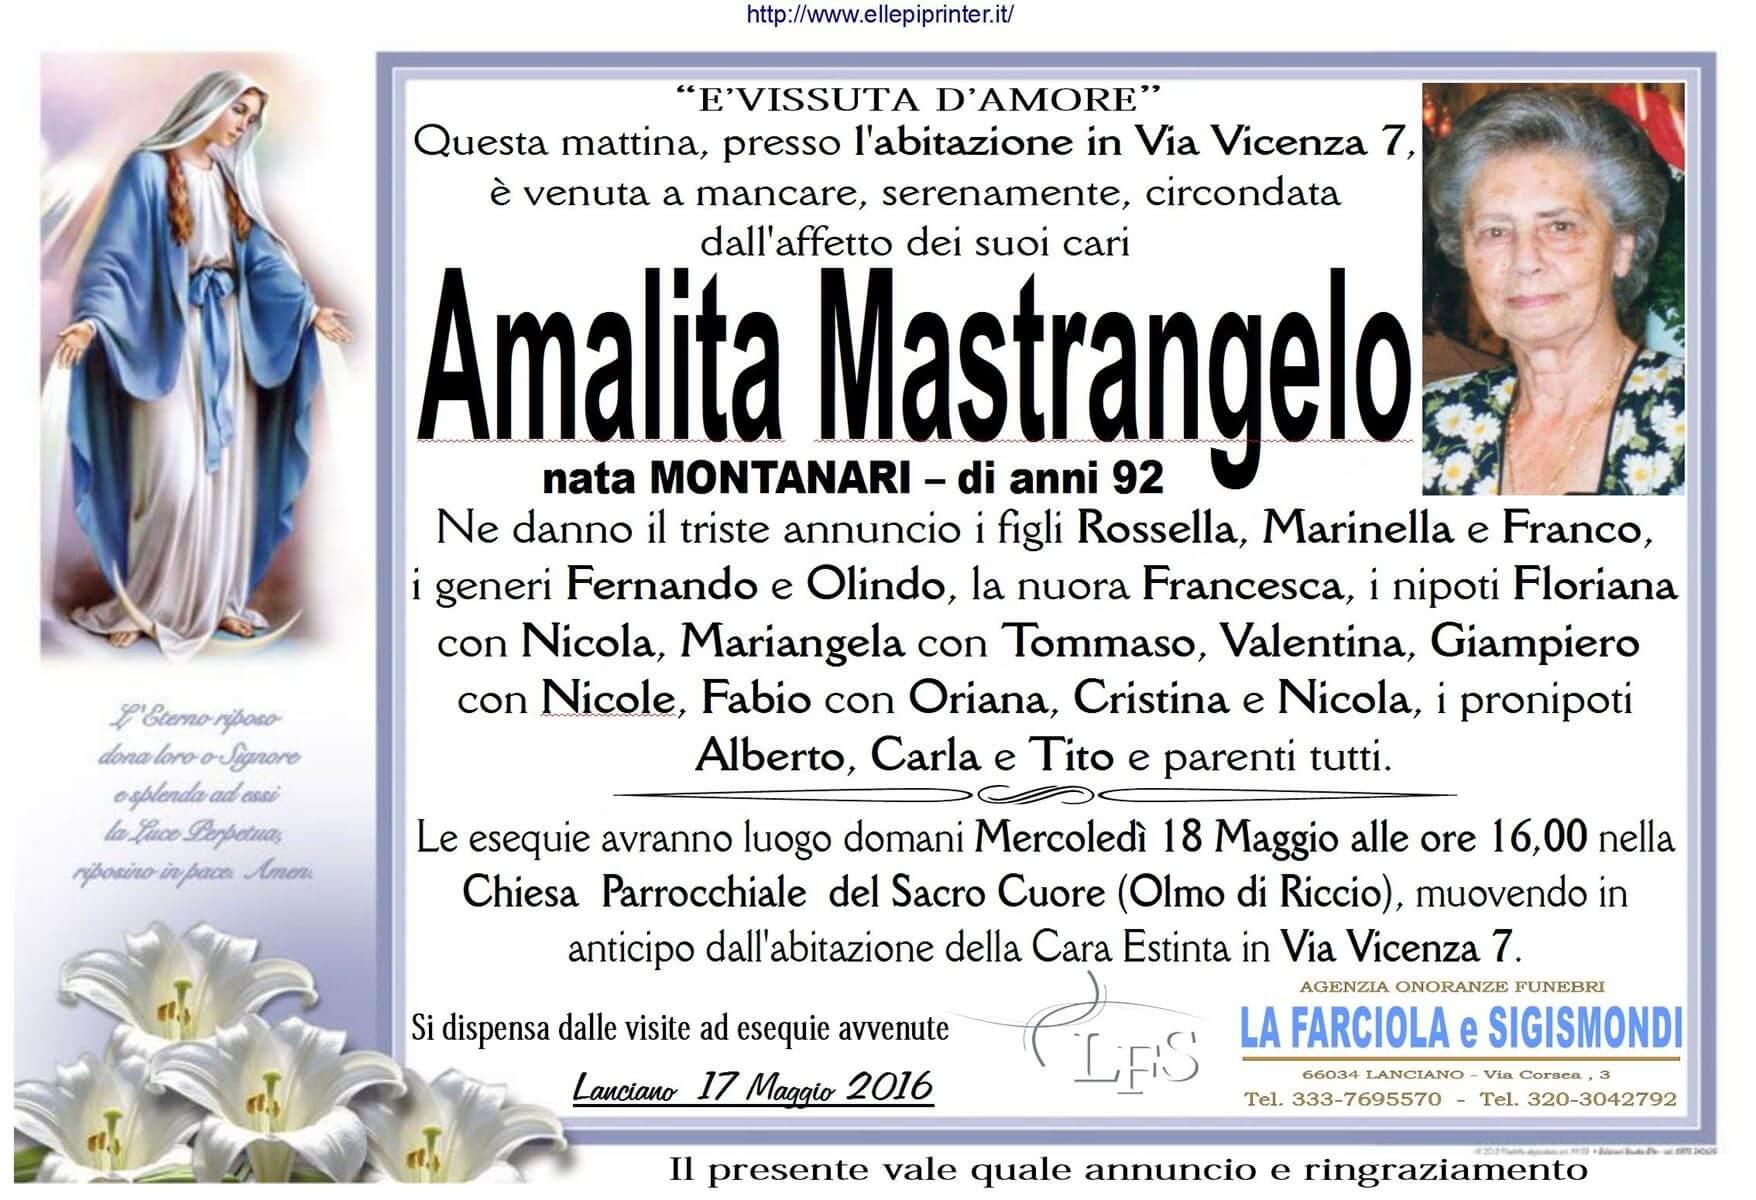 MANIFESTO MASTRANGELO AMALITA